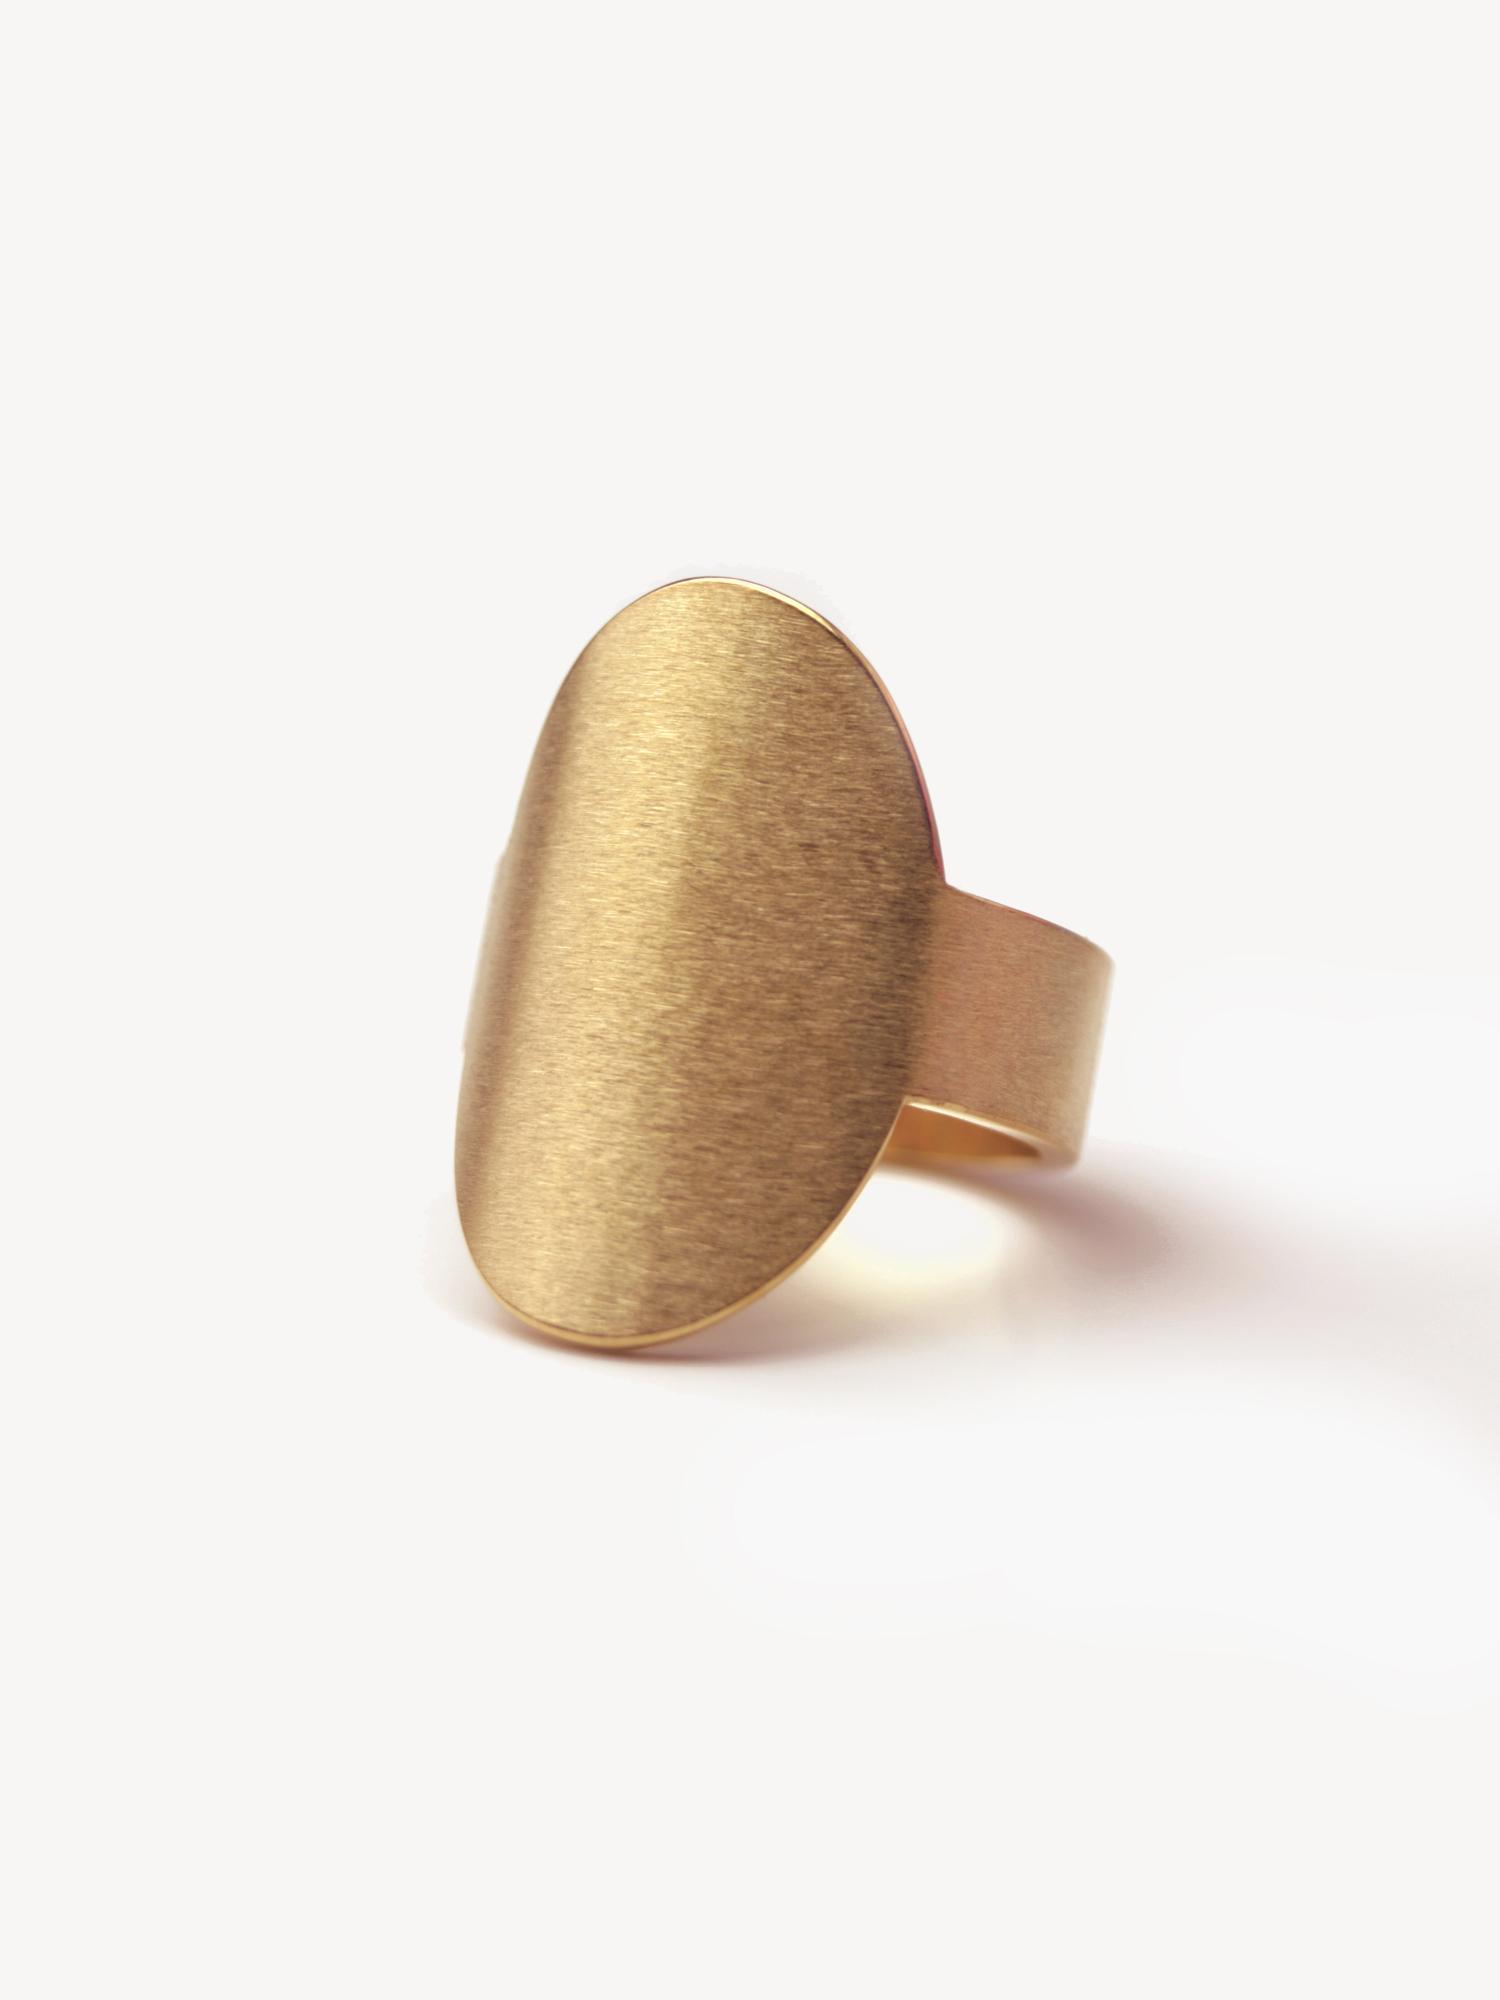 Siegelring Anda, hochoval groß in vergoldetem Silber  Signet ring Anda, vertical oval big in goldplated silver